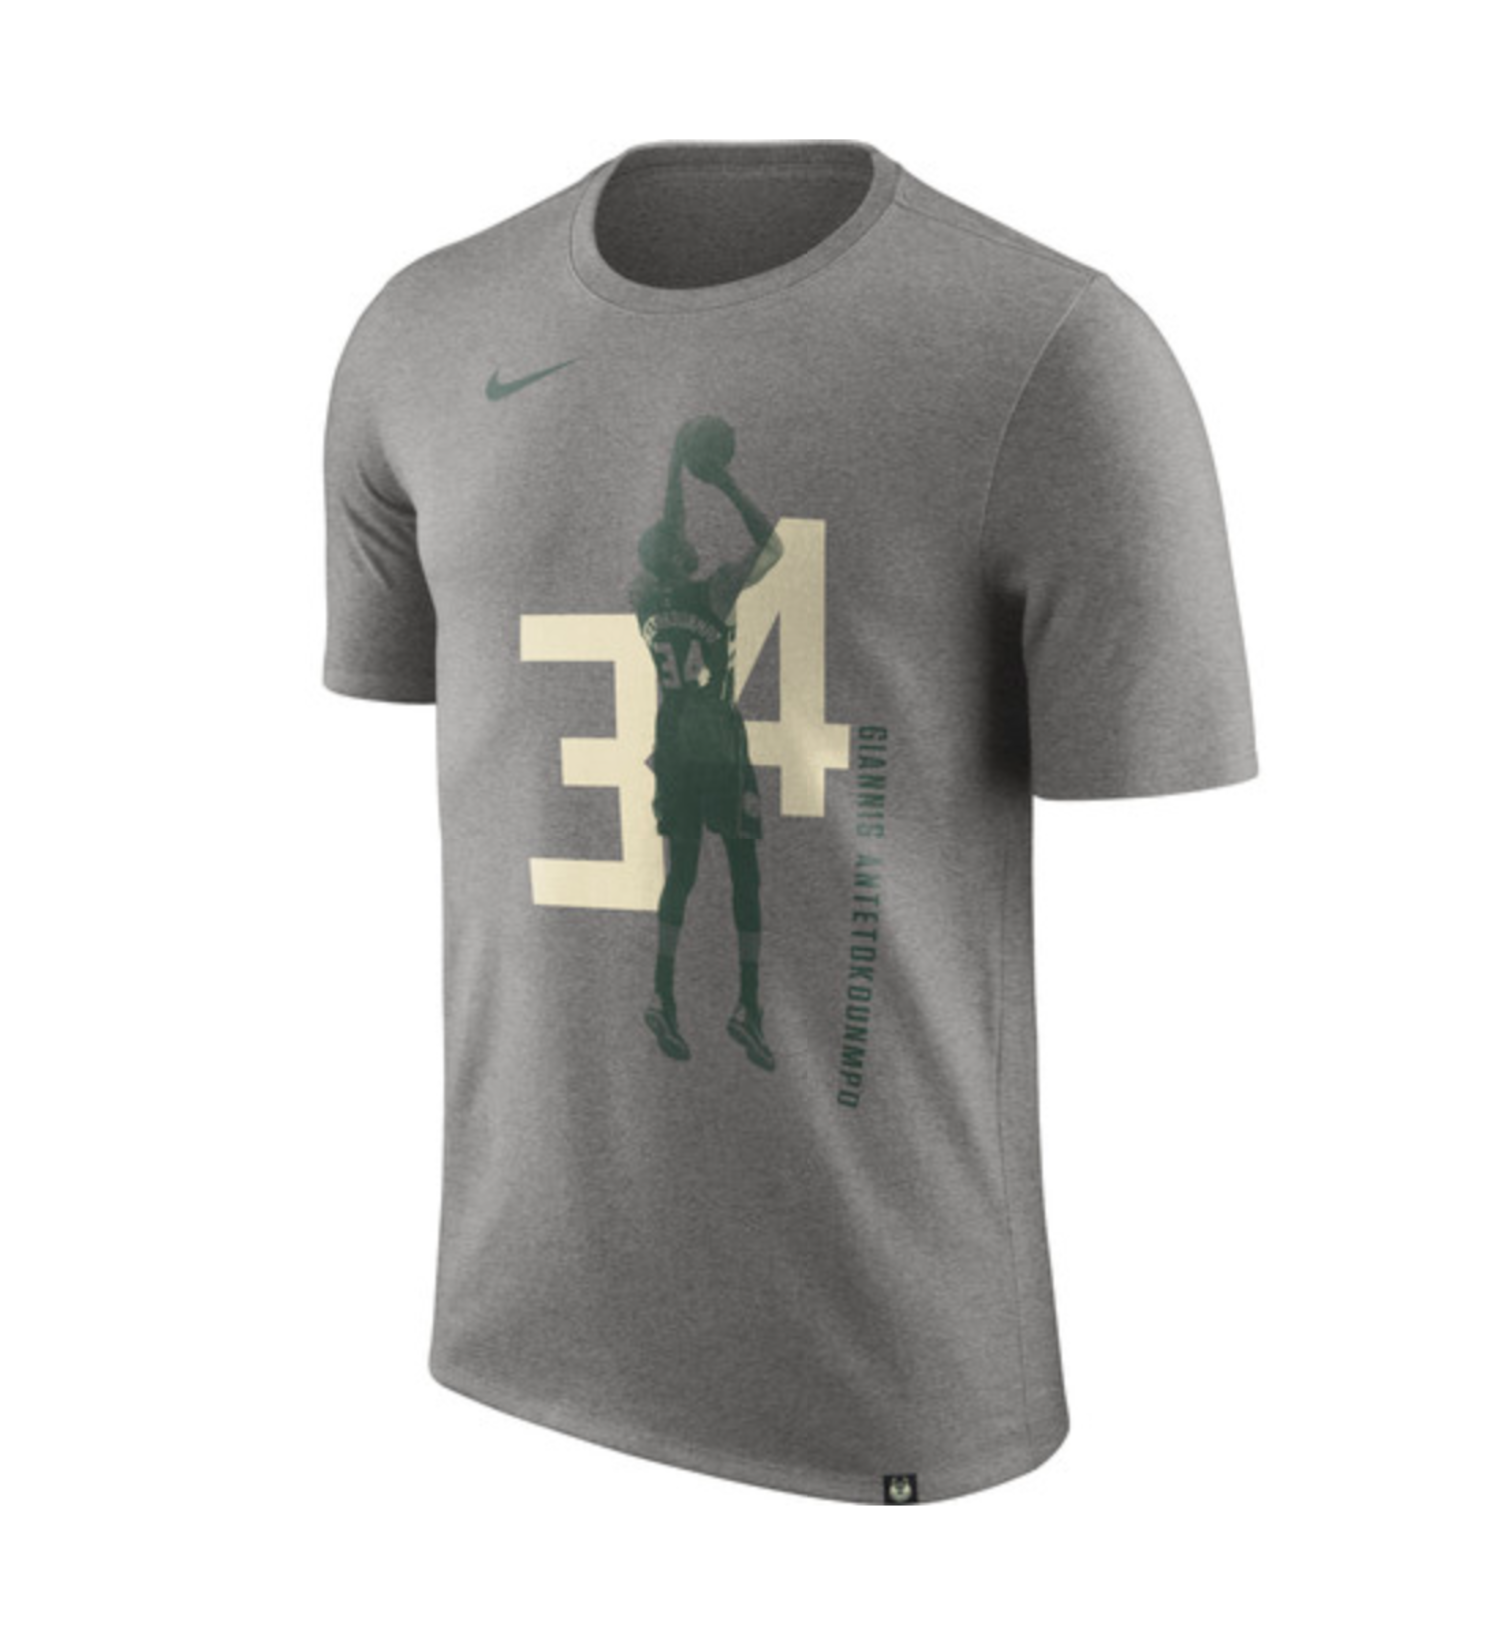 Camiseta con la silueta de Giannis Antetokounmpo.